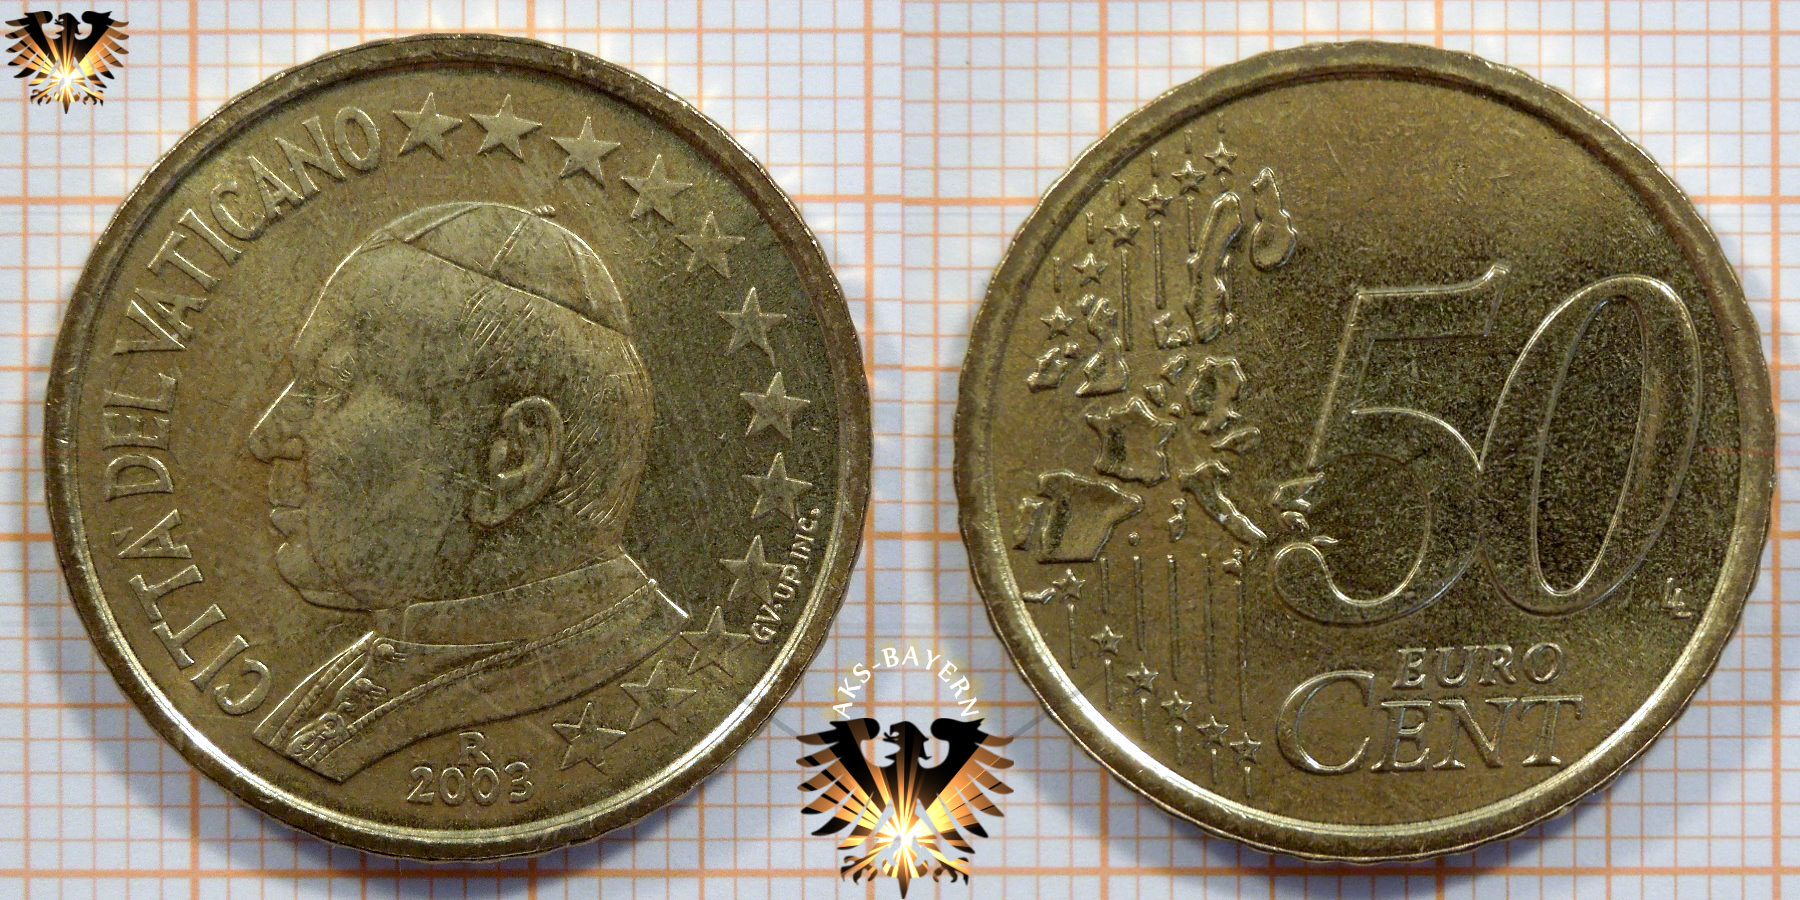 50 Euro Cent Münze Nominal Vatikan 2003 Papst Johannes Paul Ii